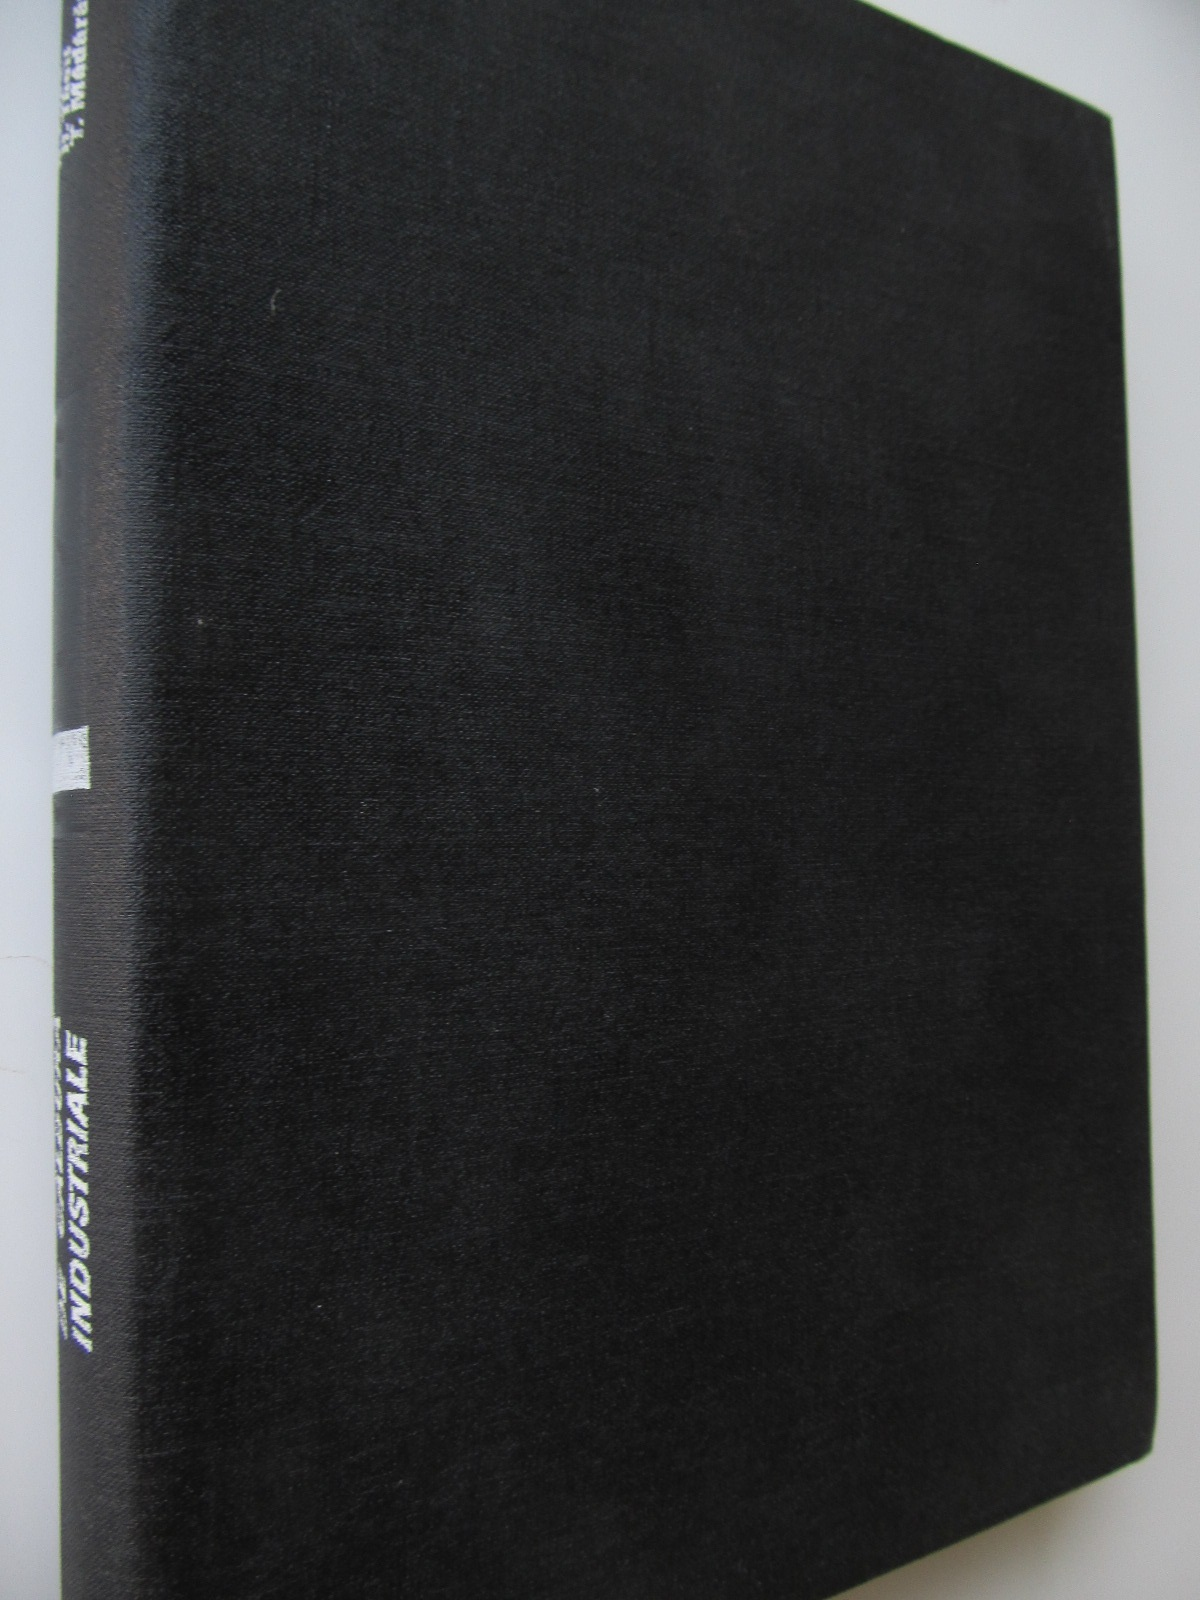 Schimbatoare de caldura industriale - Bazil Popa , Helmuth Theill , .. | Detalii carte